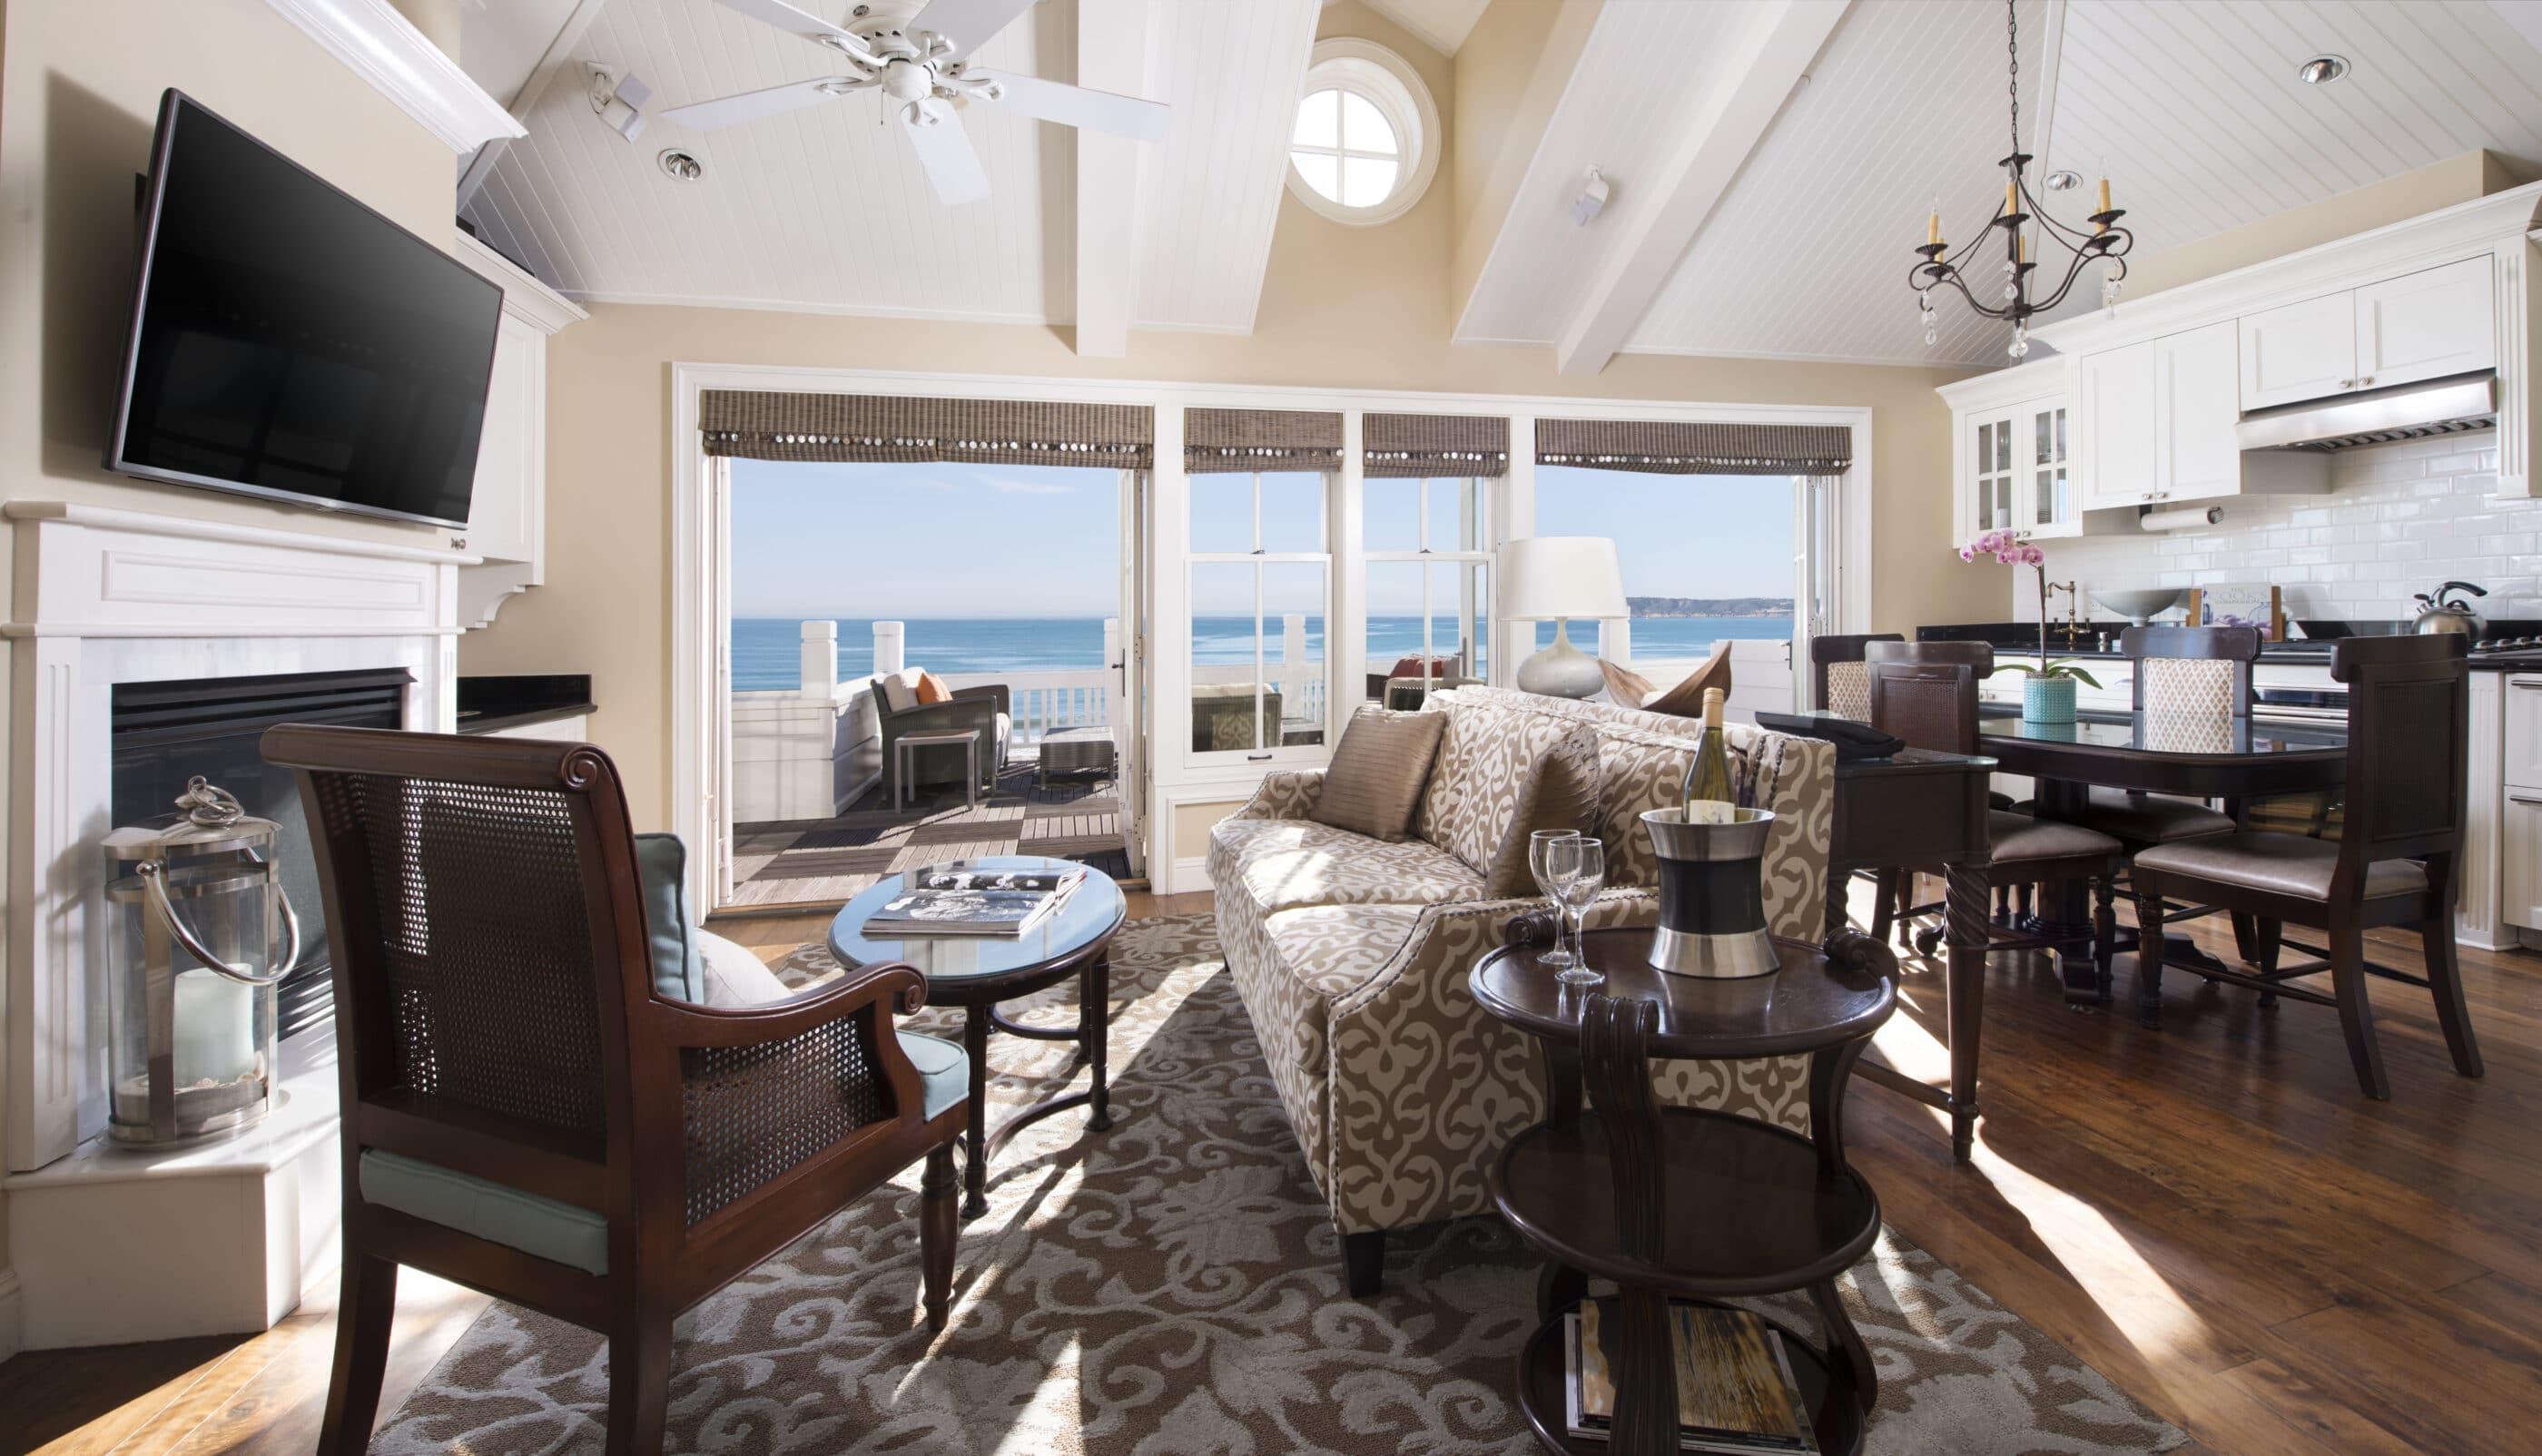 A living room overlooking the ocean at Beach Village in Coronado.